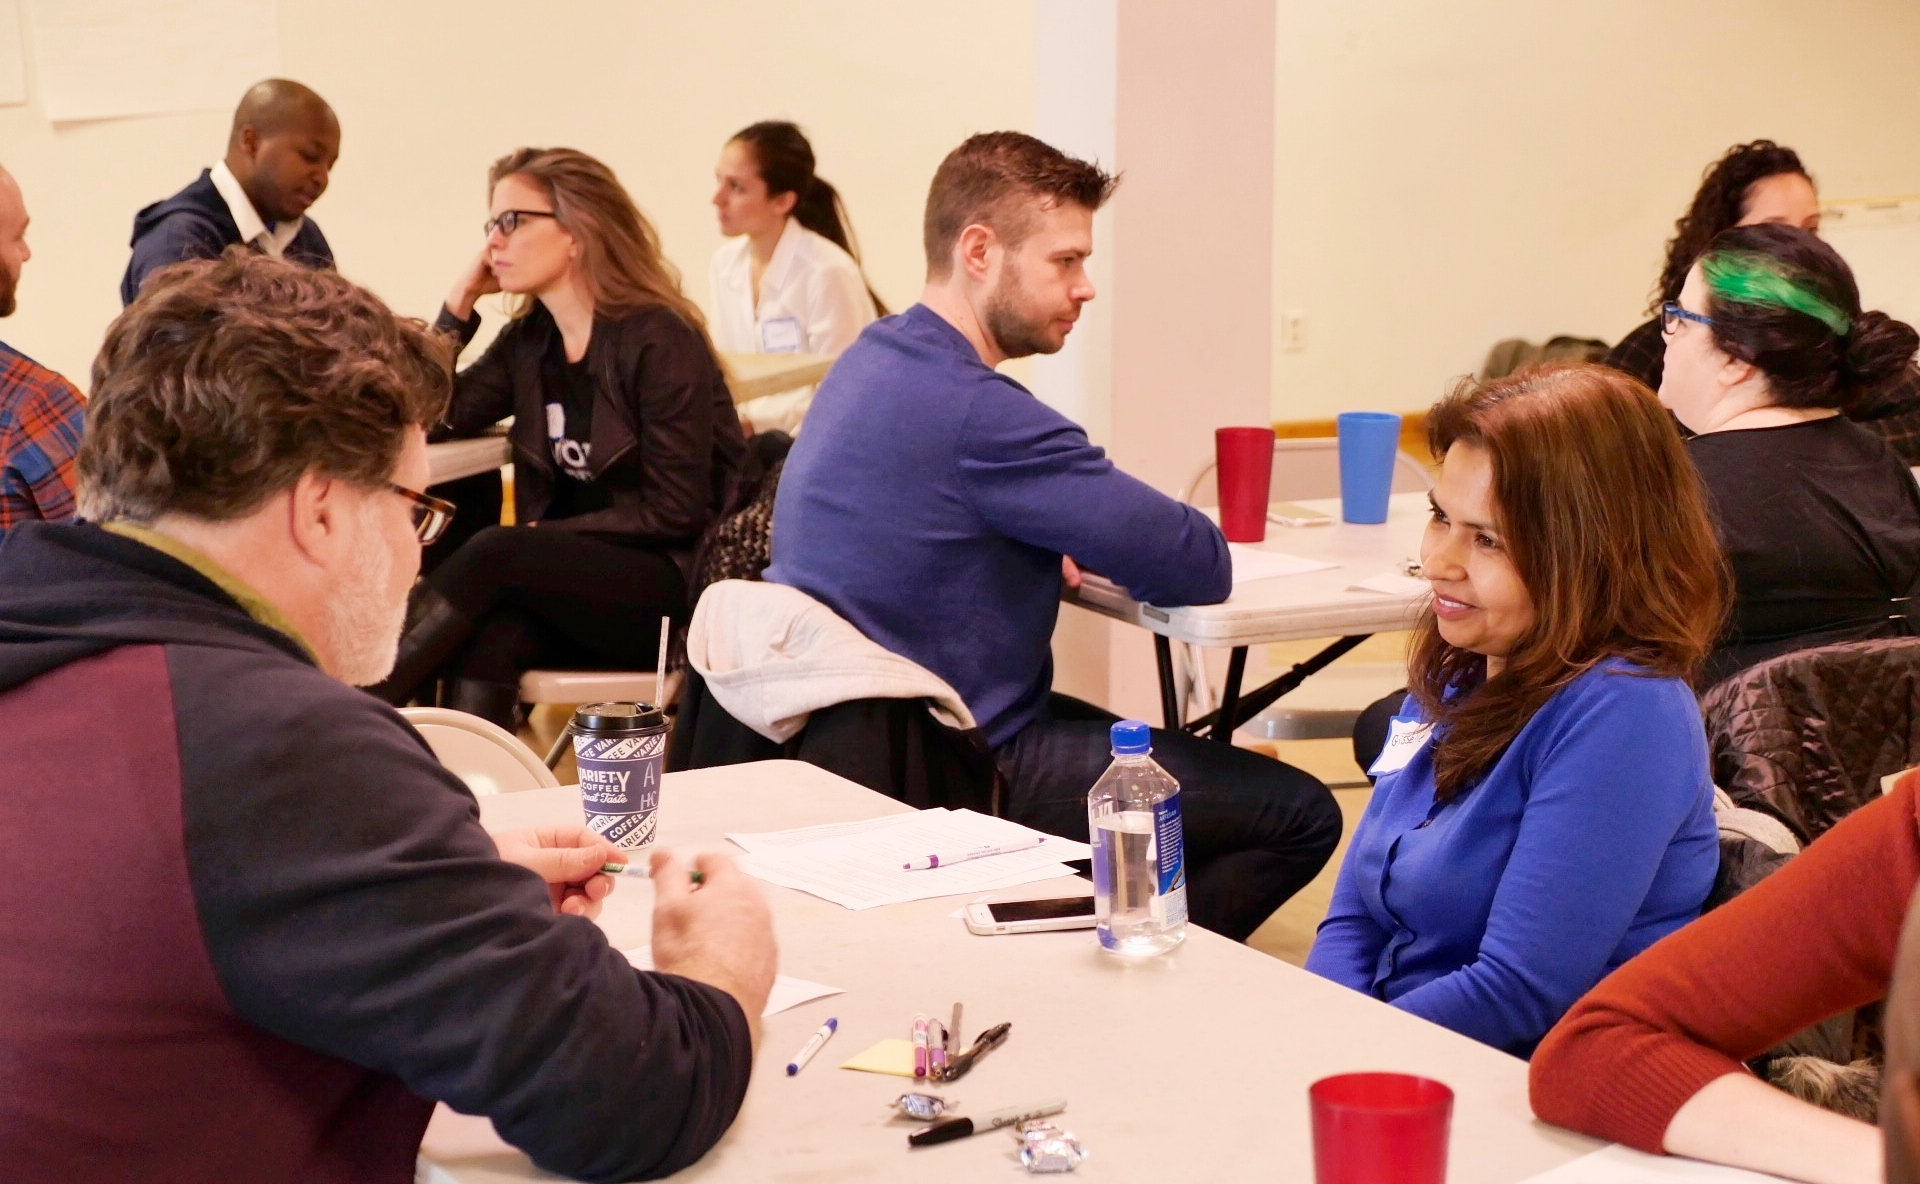 Above: Vision Workshop facilitators training.